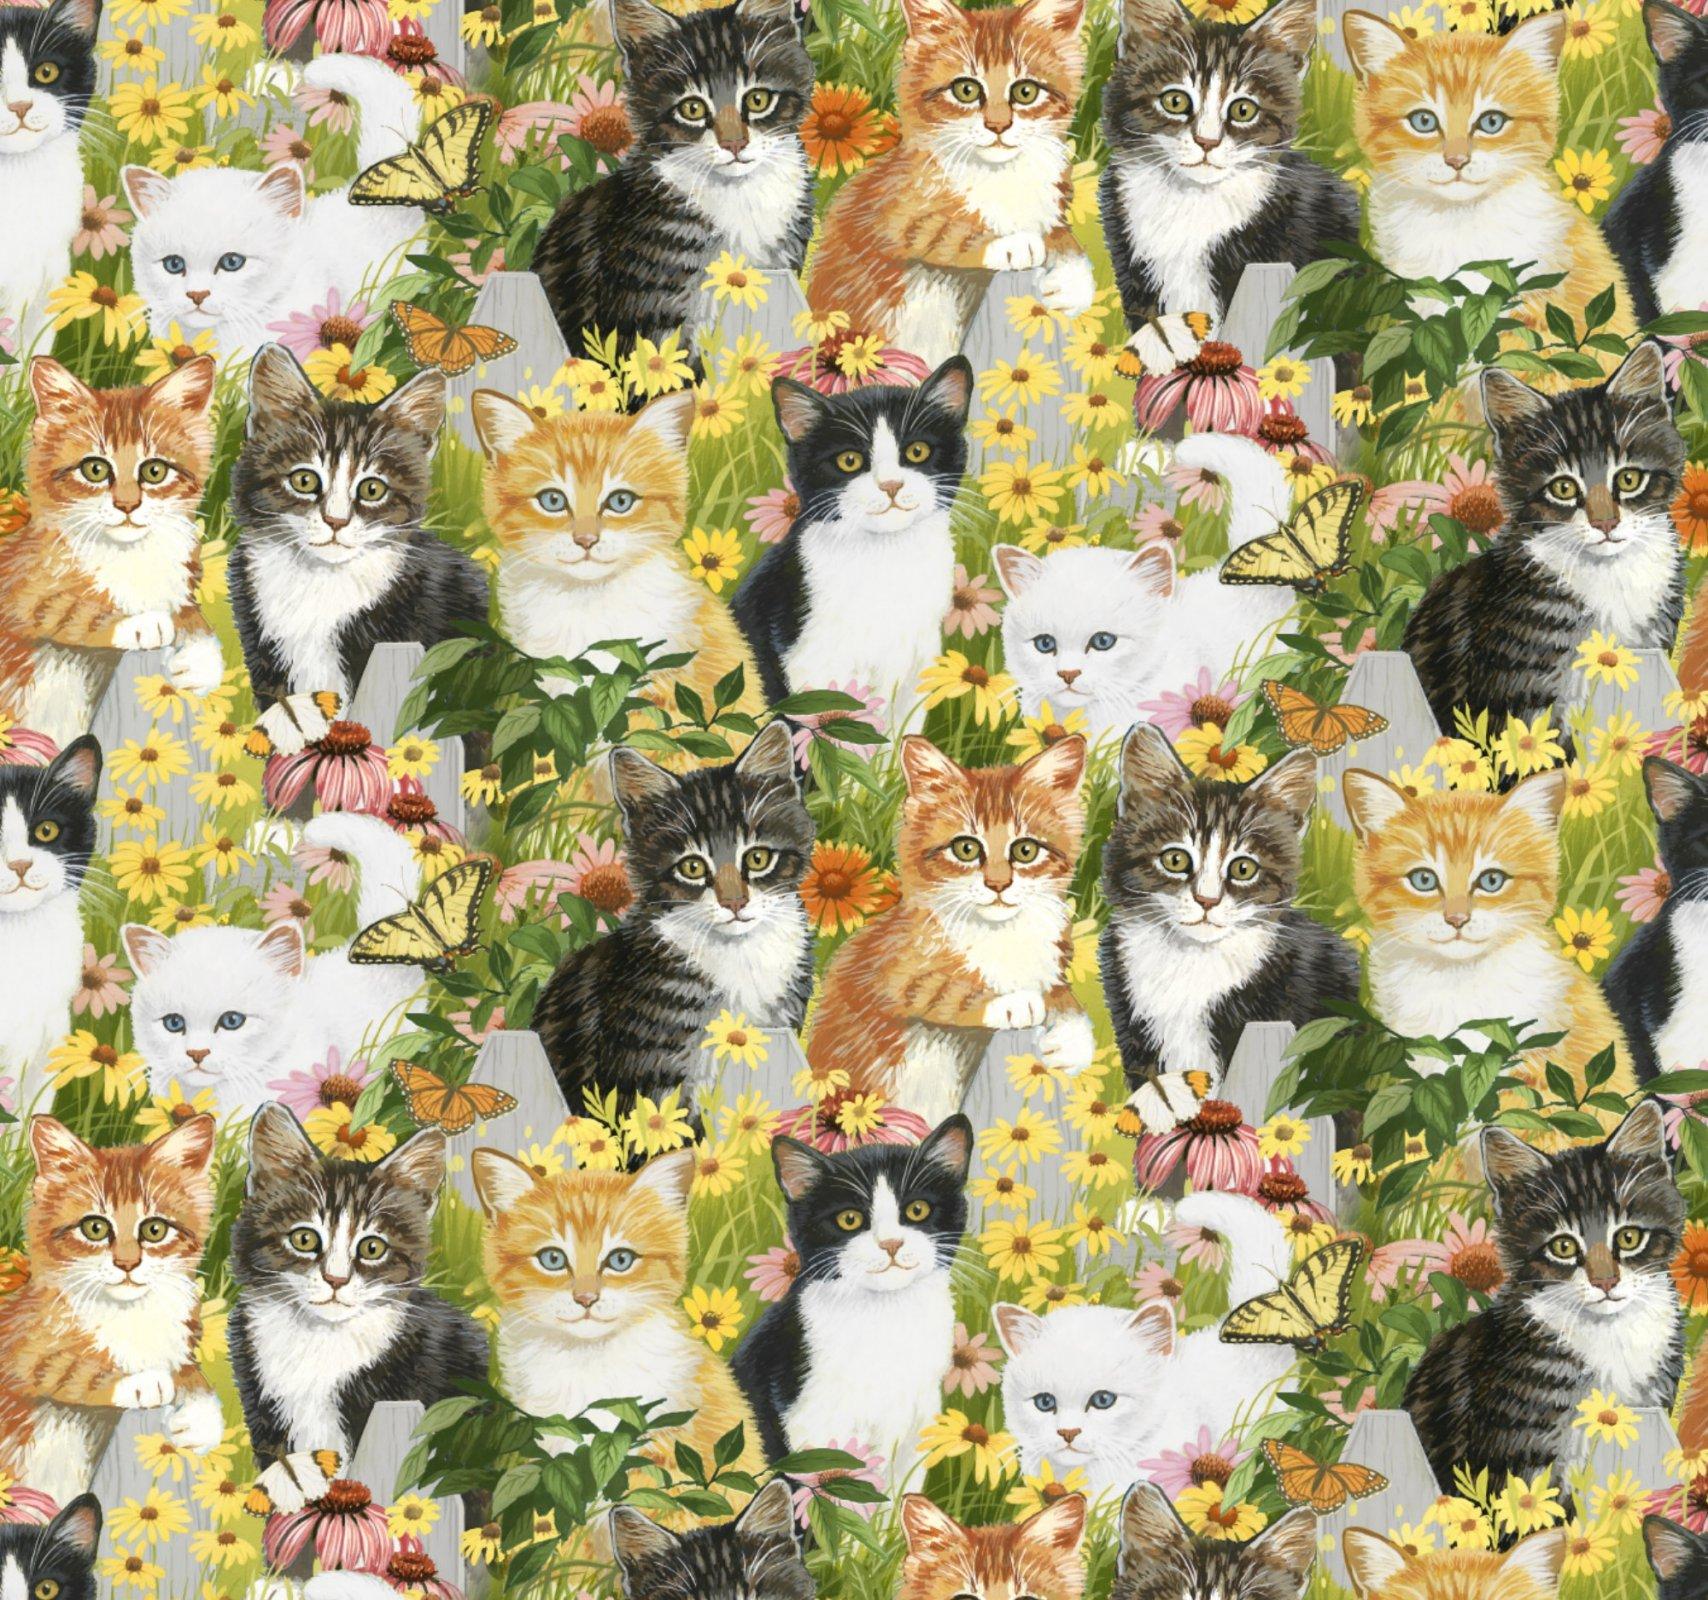 DT-Animal Love AL-3583-0C-1 Multi - Kittens and Daisies